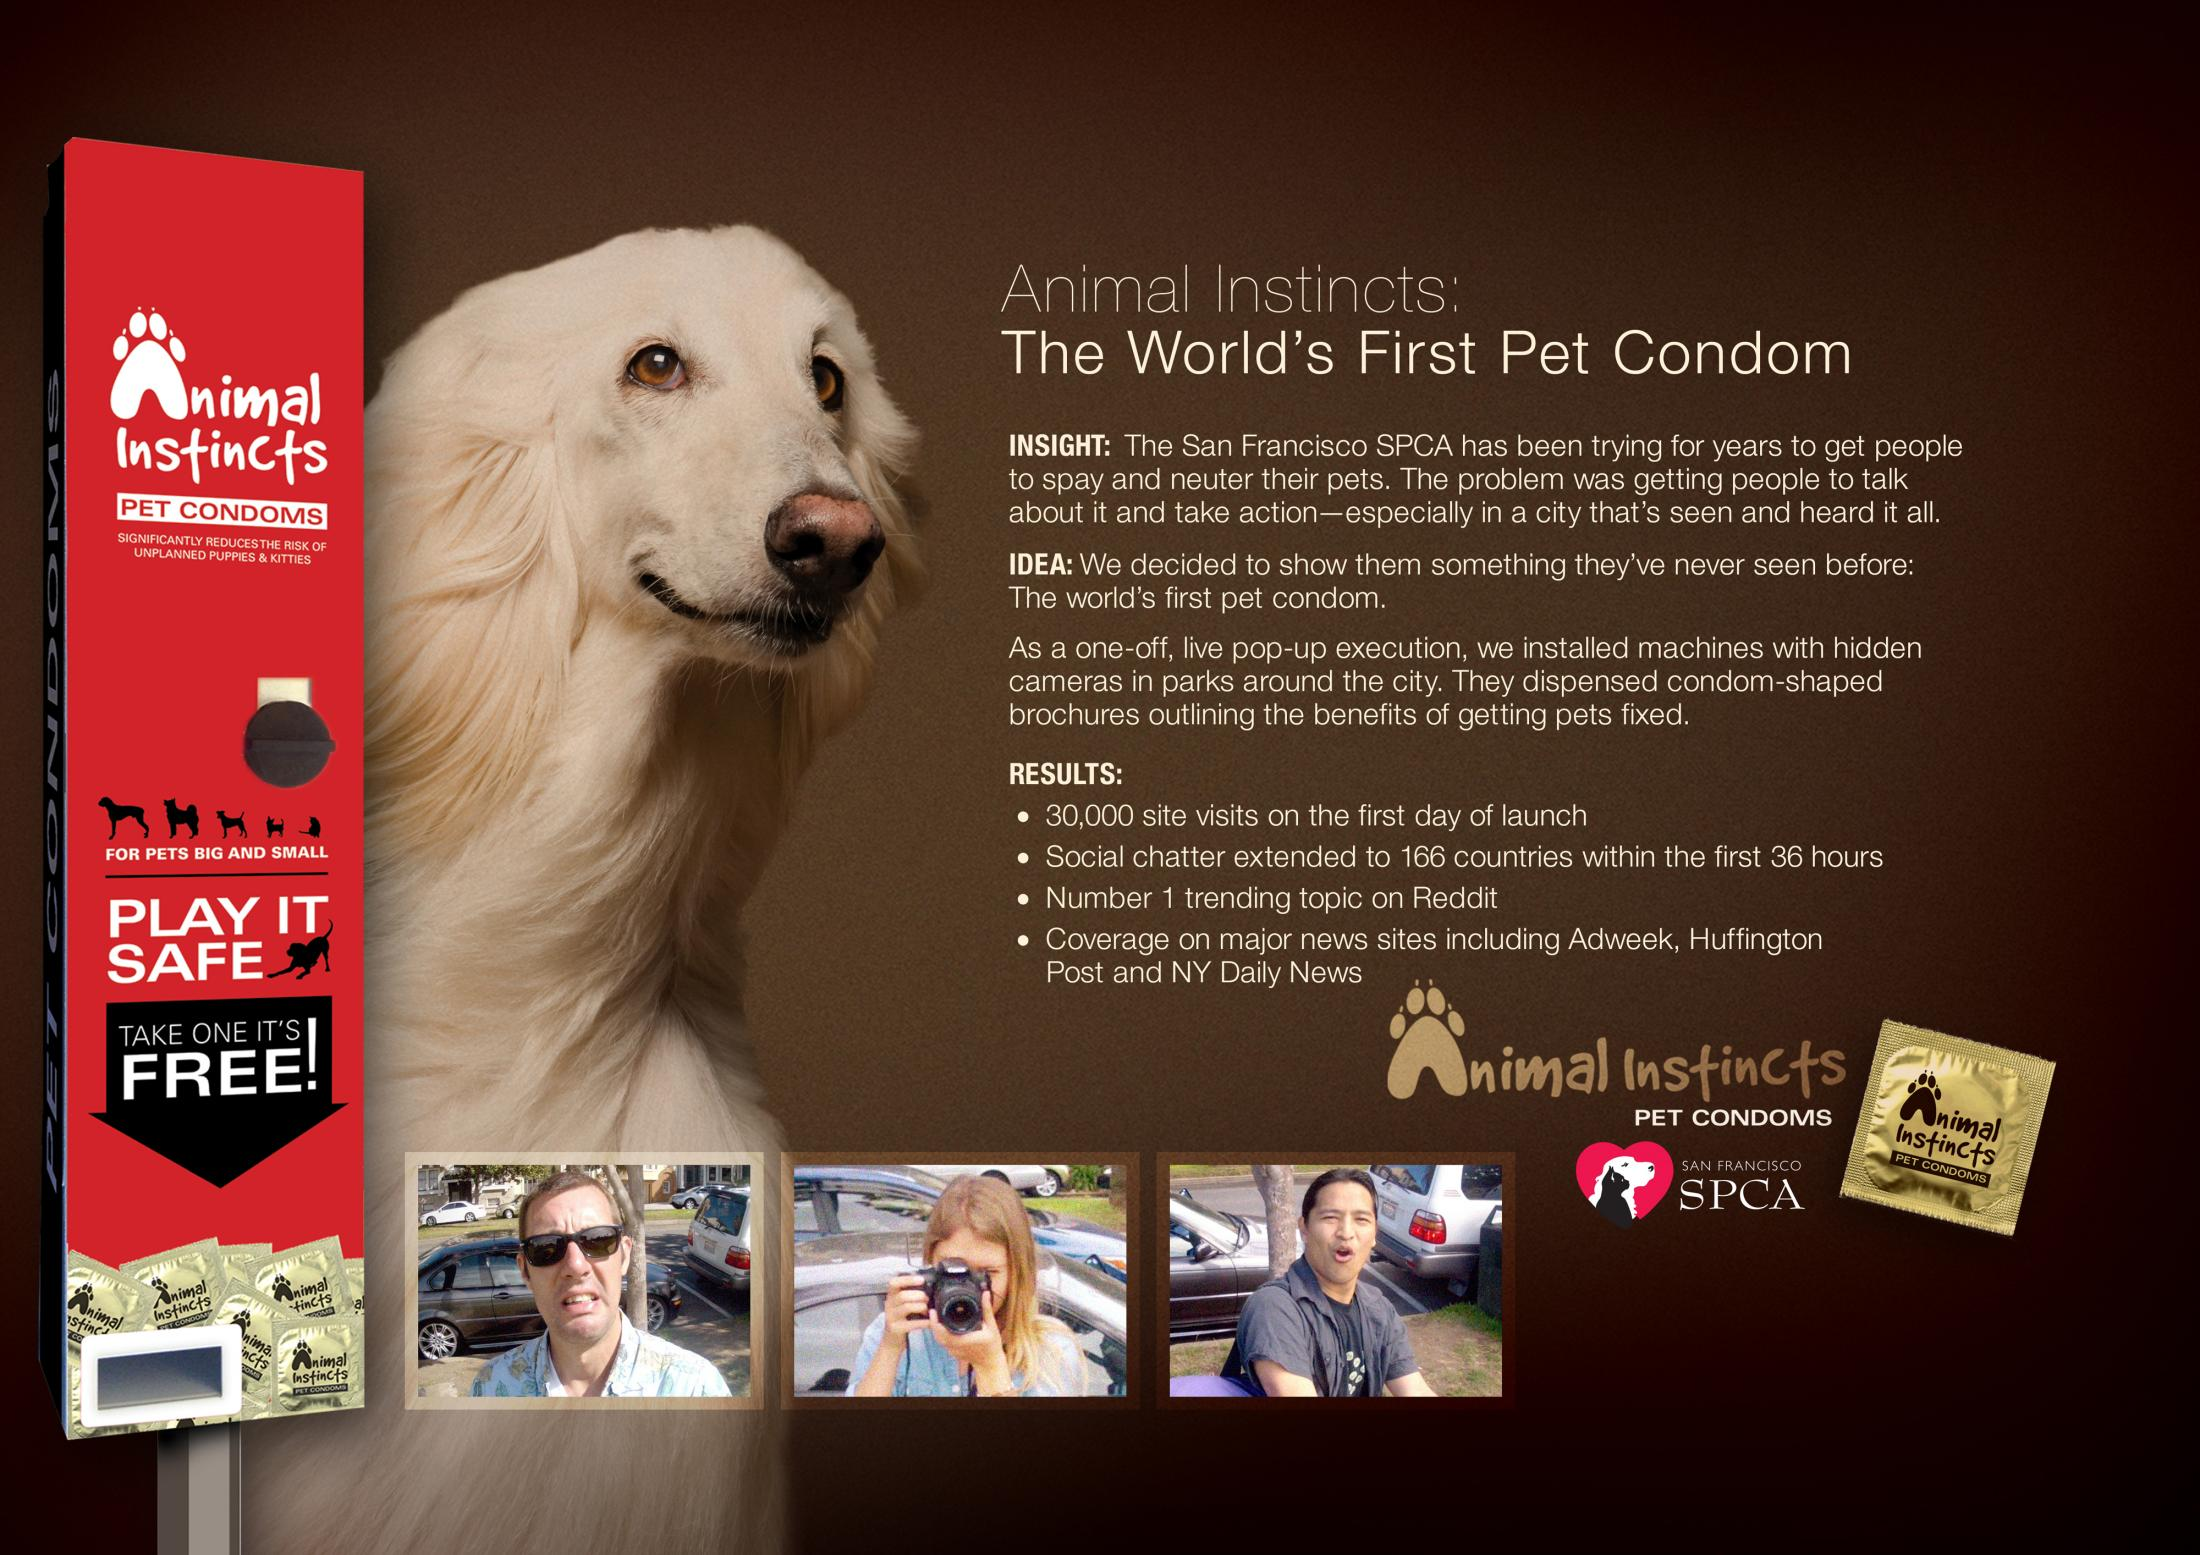 Thumbnail for San Francisco SPCA Animal Instincts Pet Condoms